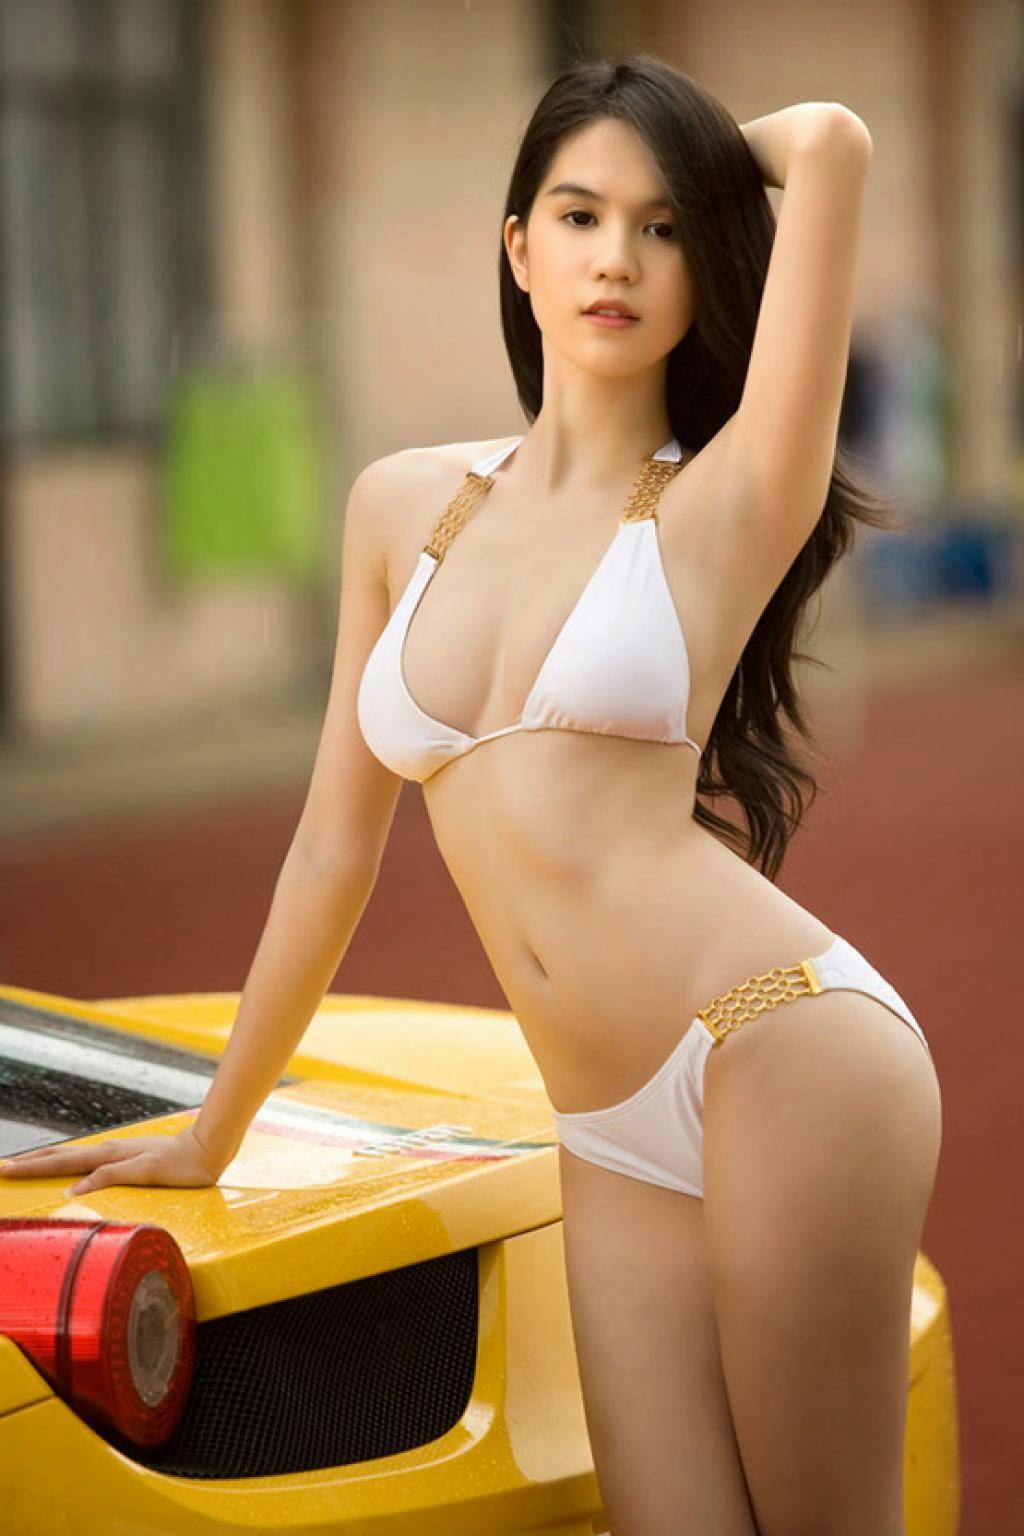 Nude Asian Teen Girl